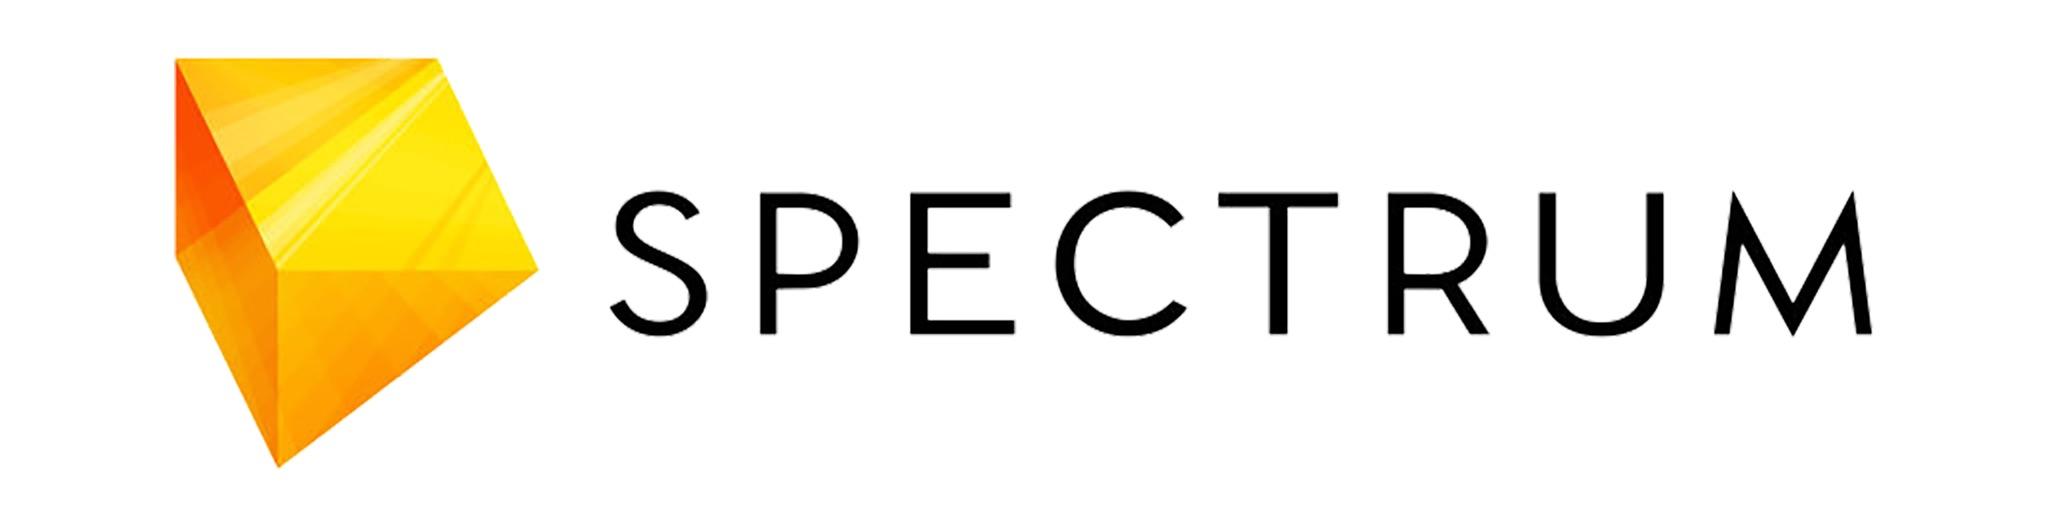 Spectrum News banner